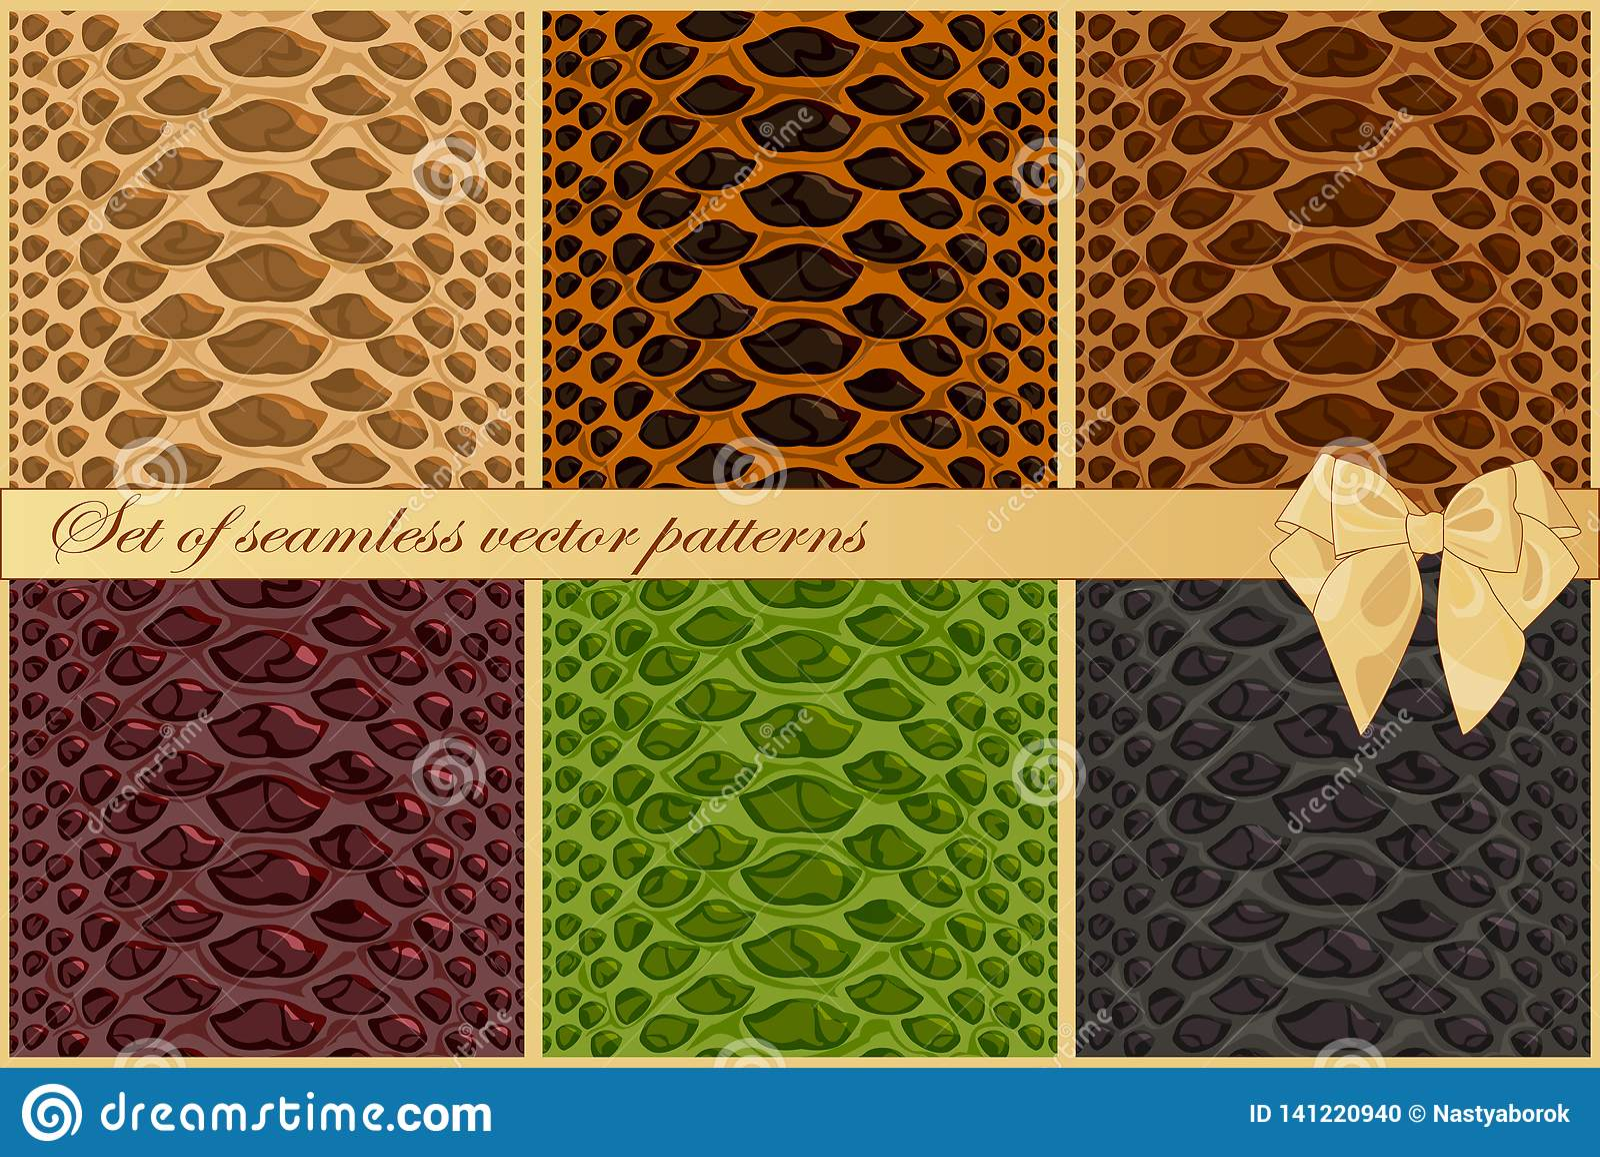 Установите картин вектора кожи змейки и гада 6 текстур моды